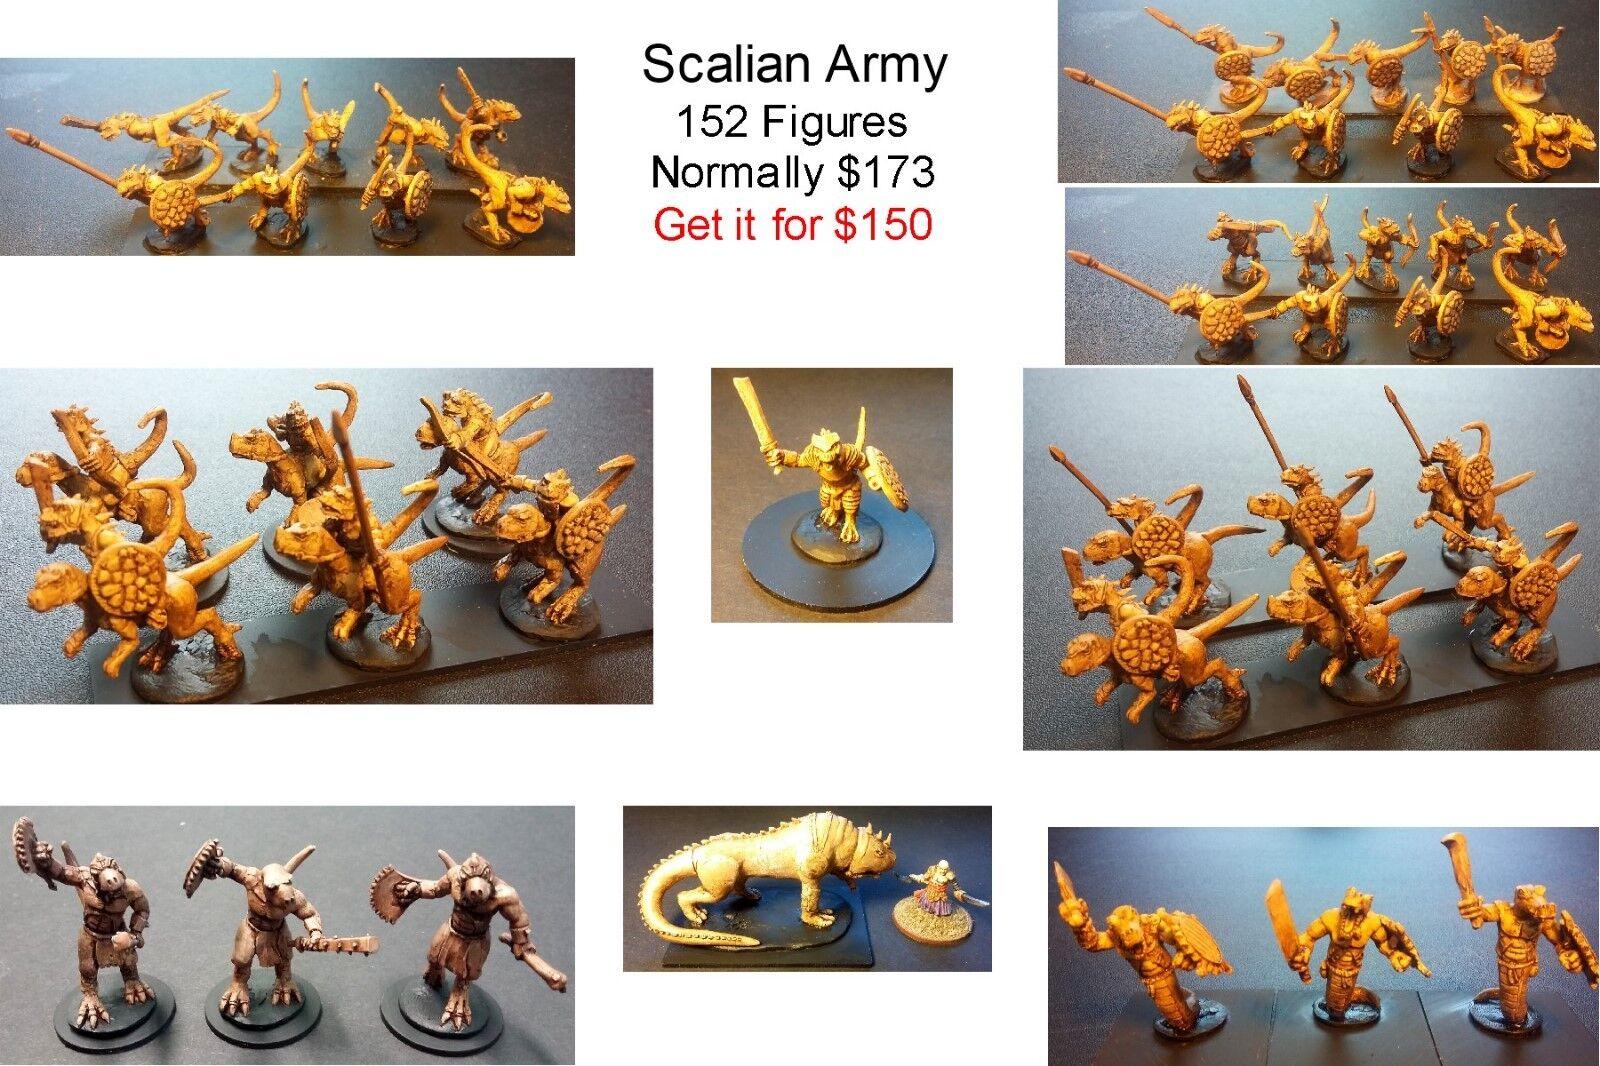 15mm Fantasy Scalian Core Army (152 figures) figures) figures) Normally 5e2347